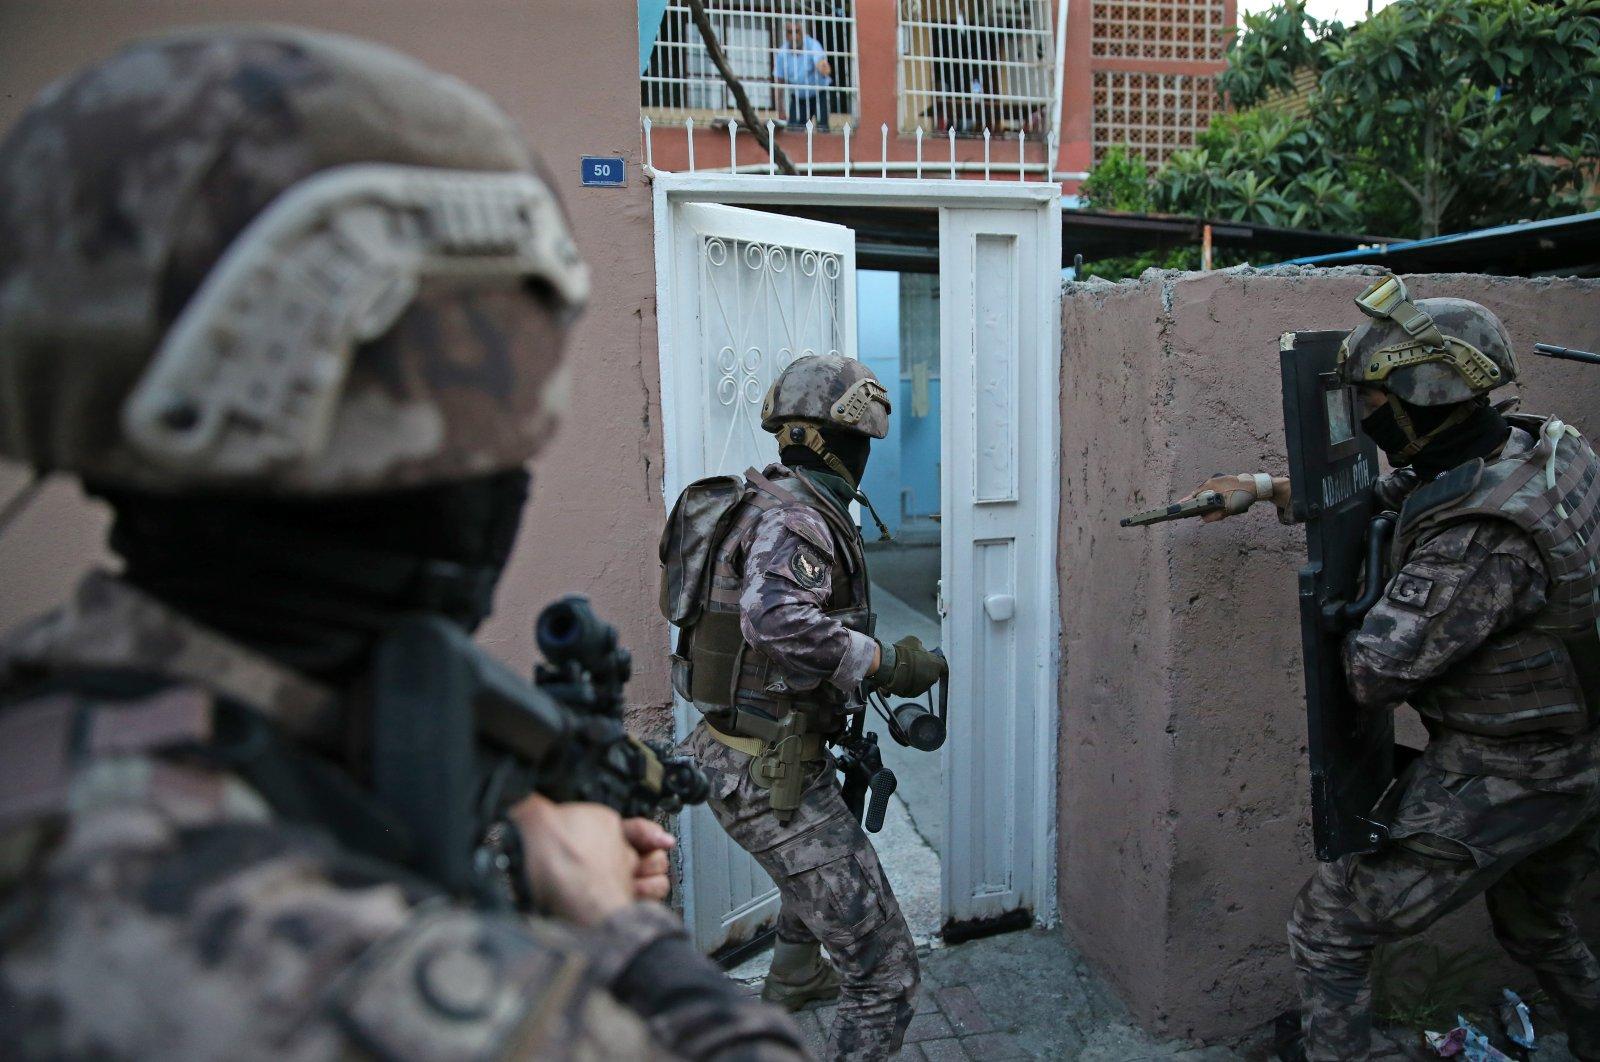 Counterterrorism police conduct an operation in Adana province, June 10, 2020 (AA photo)